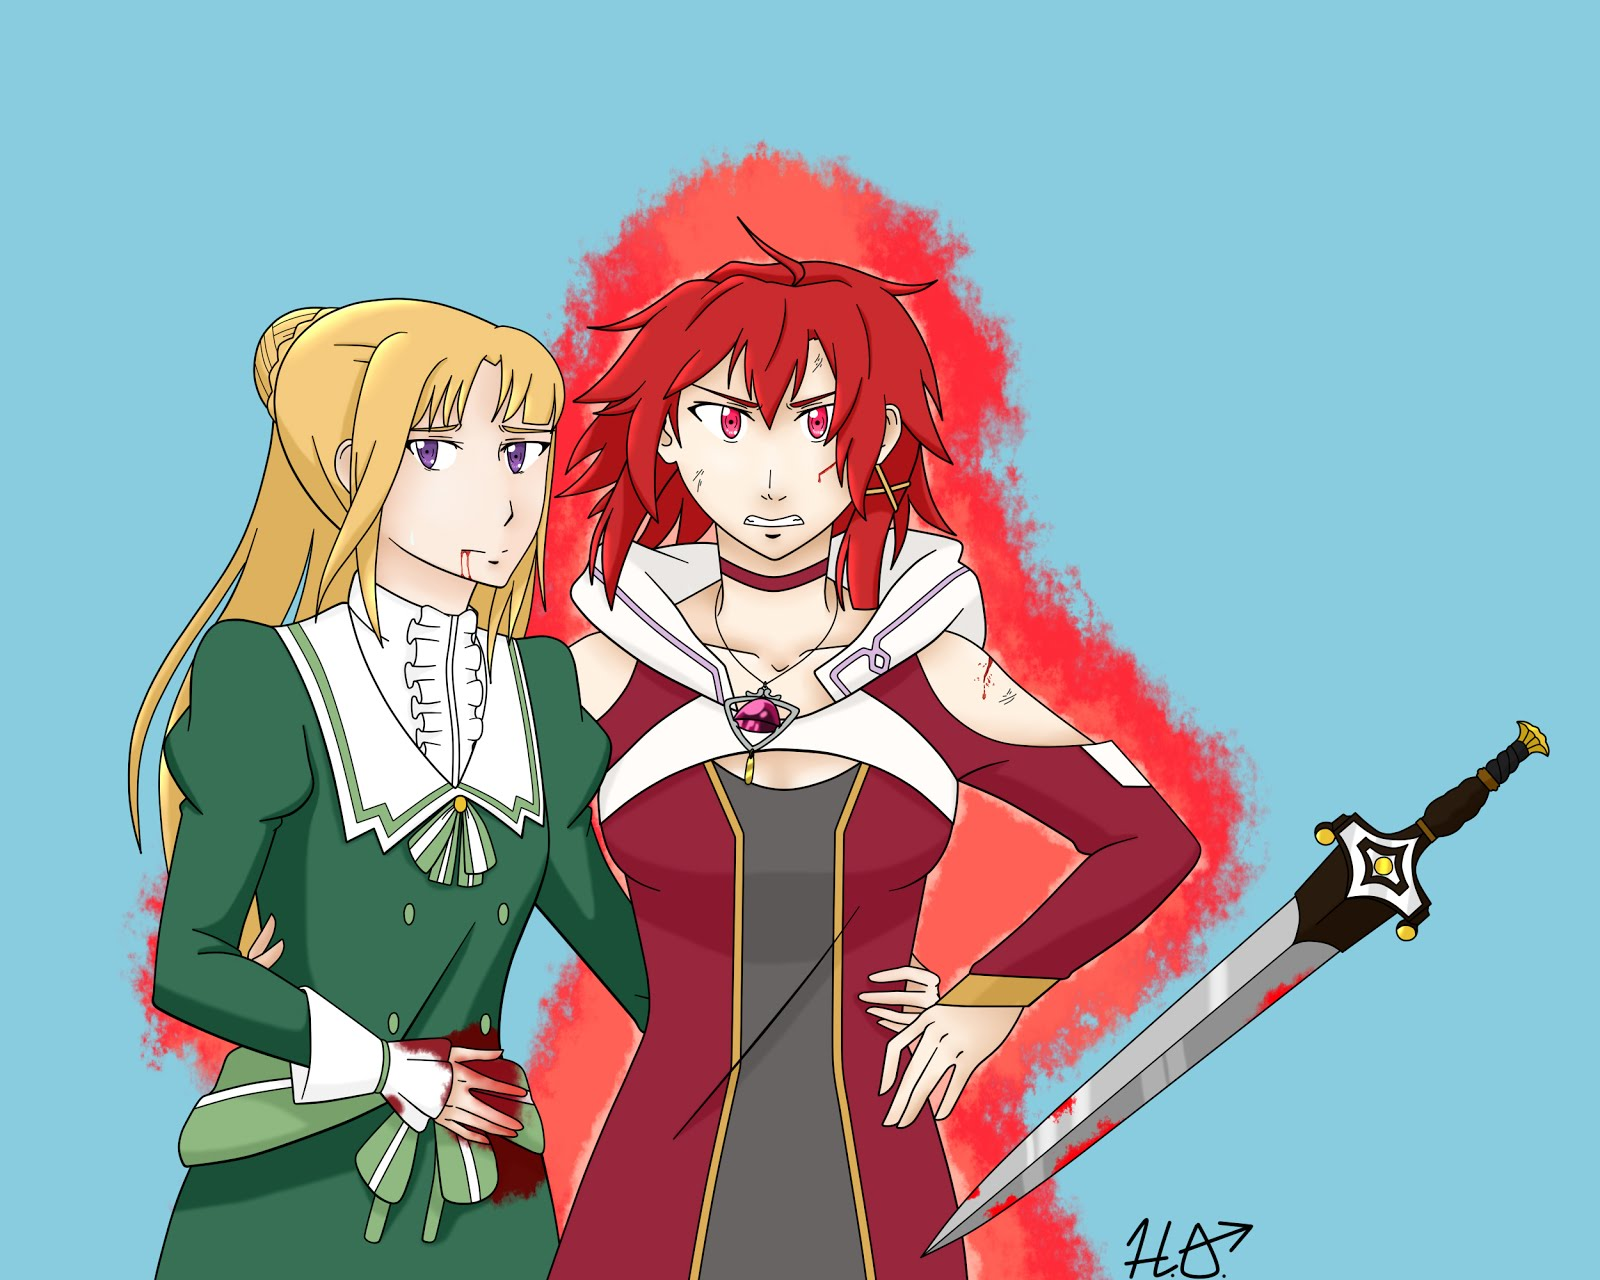 Izetta and Finé